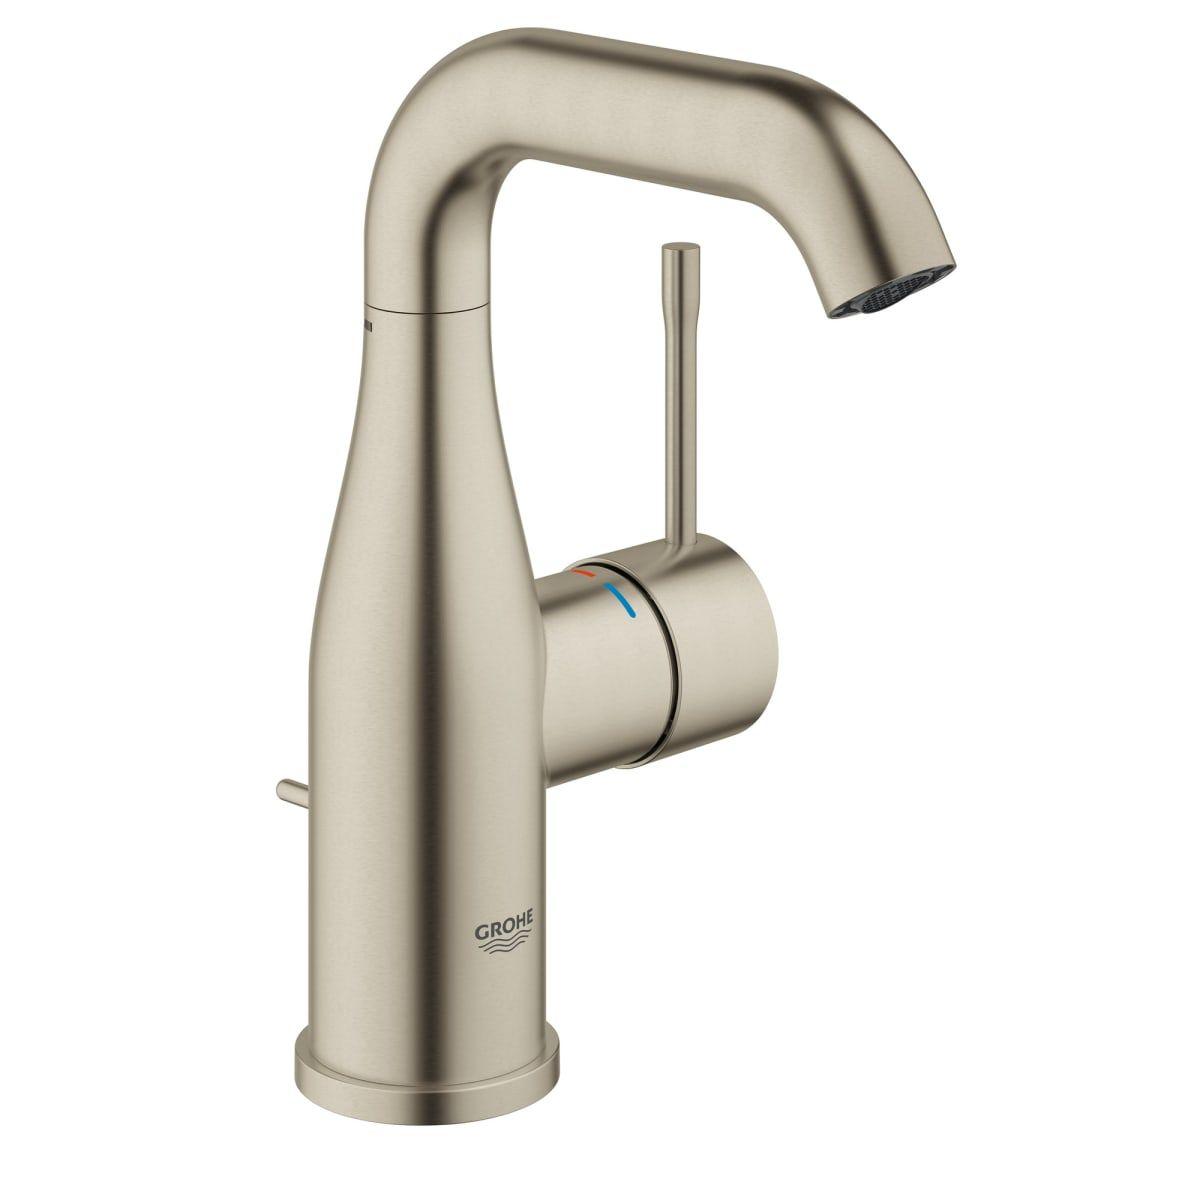 Grohe 23 485 A Build Com Bathroom Sink Faucets Single Hole Bathroom Faucets Single Hole Bathroom Faucet [ 1200 x 1200 Pixel ]